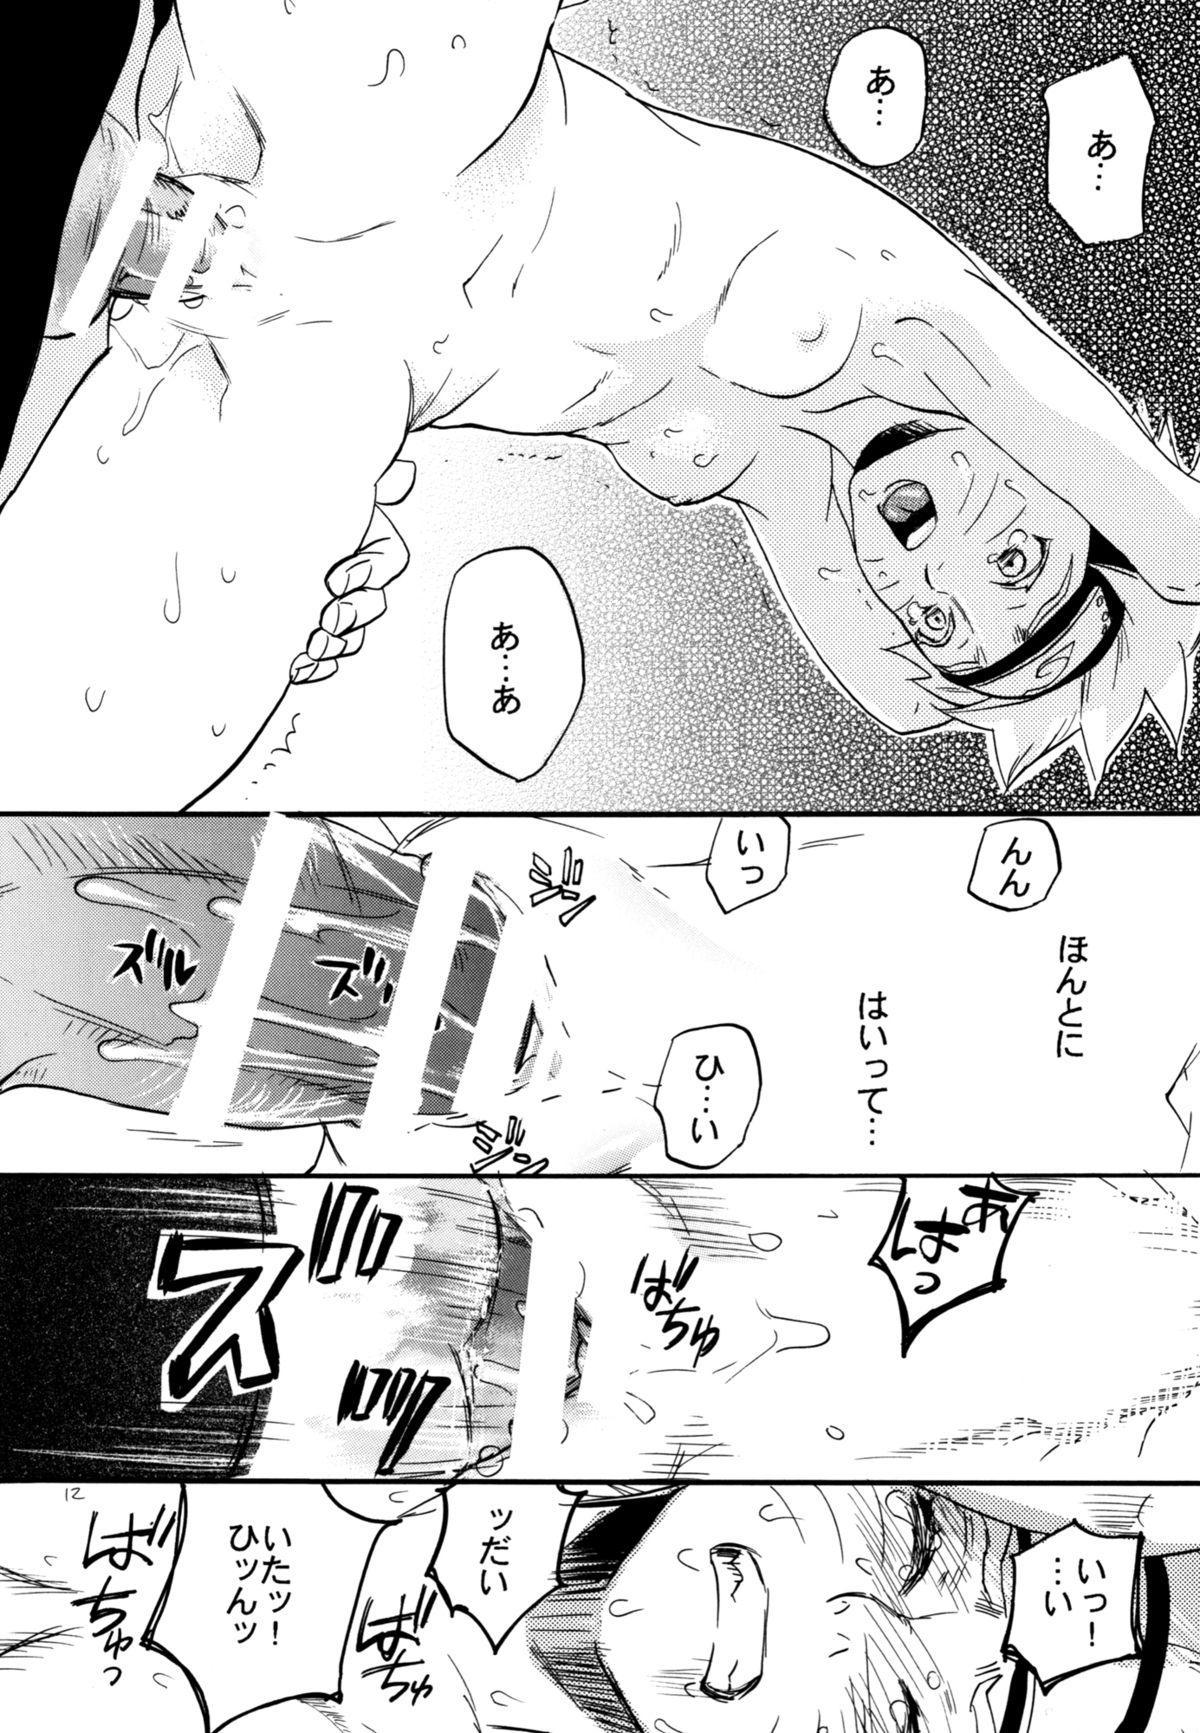 Three-Man Cell ga Iroiro Okashii 9